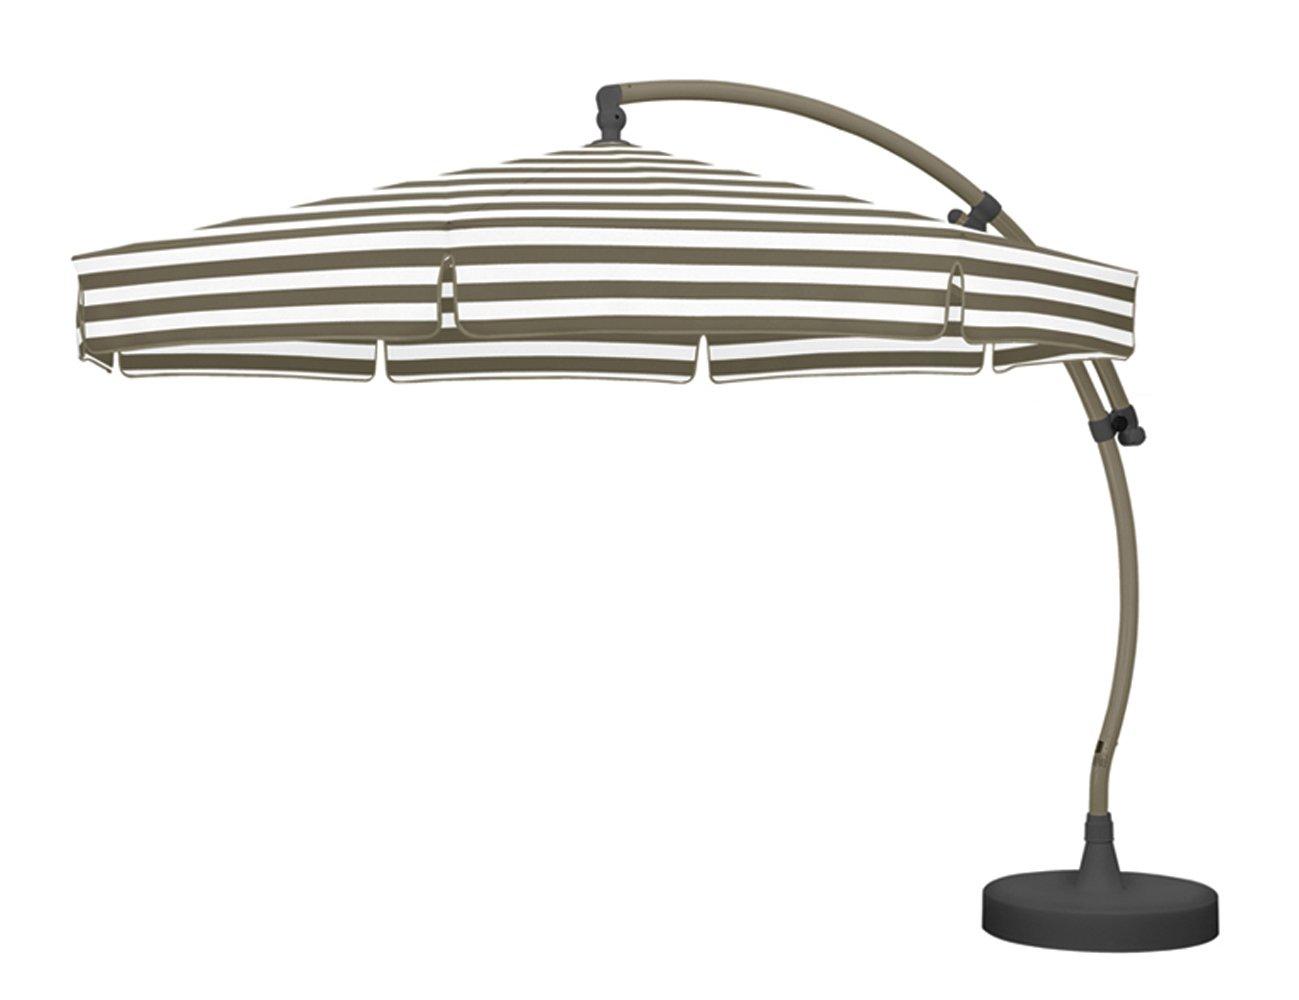 sun garden 10155810 ampelschirm easy sun polypropylen. Black Bedroom Furniture Sets. Home Design Ideas